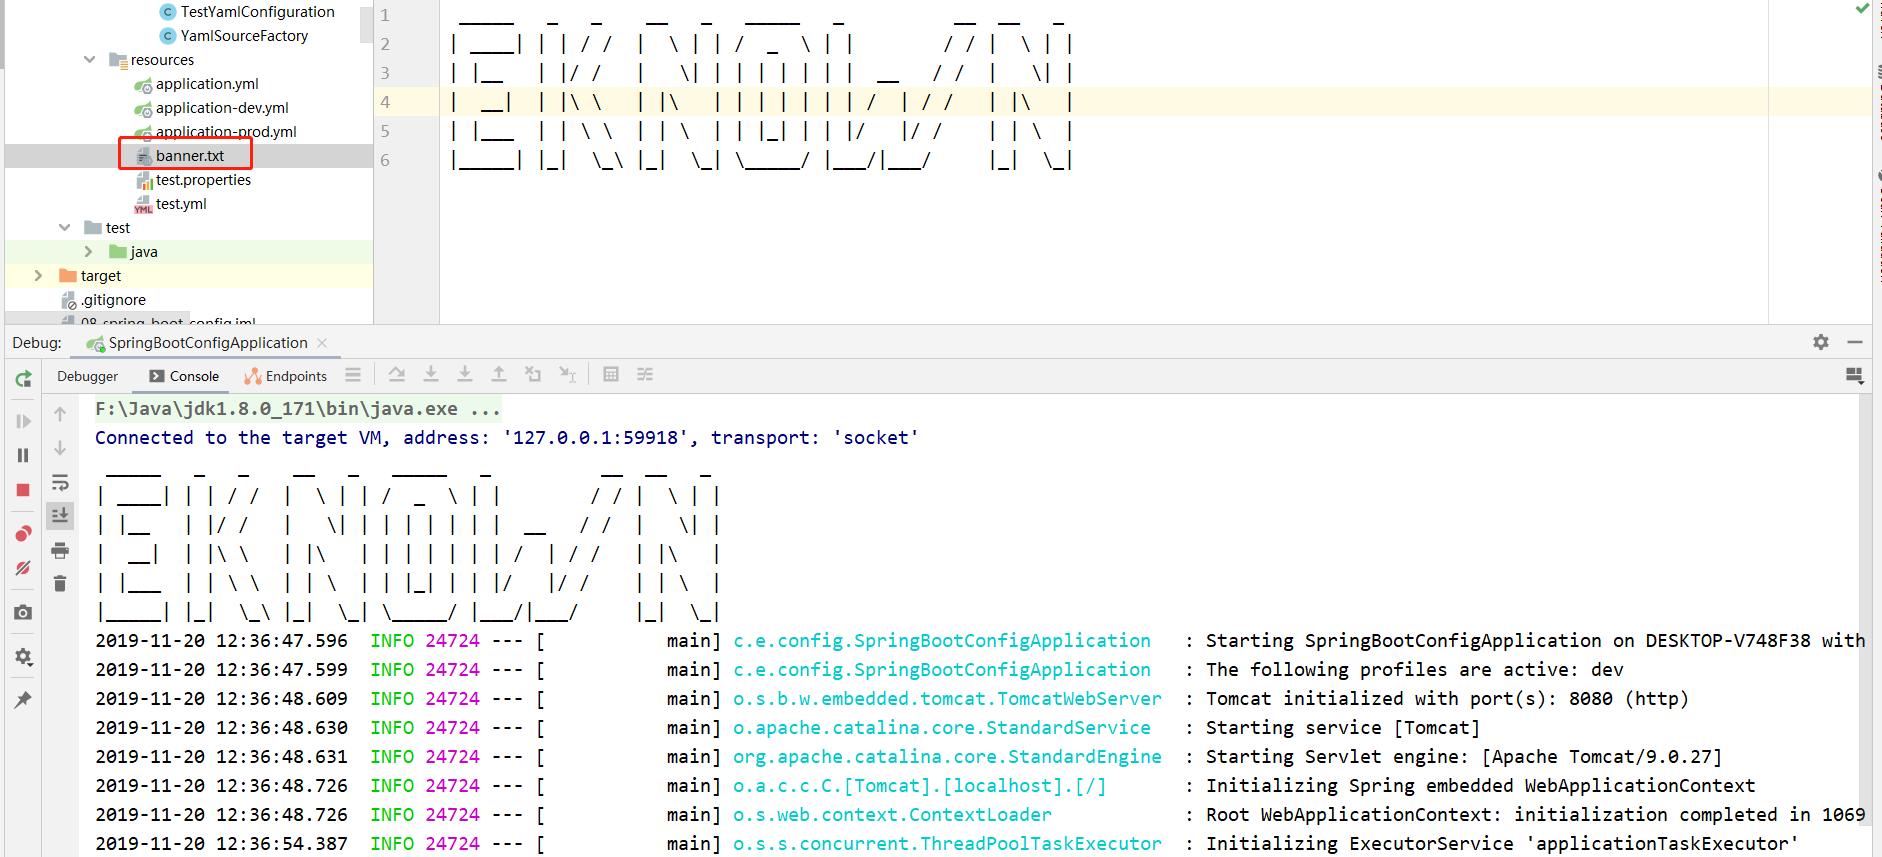 SpringBoot基本配置詳解